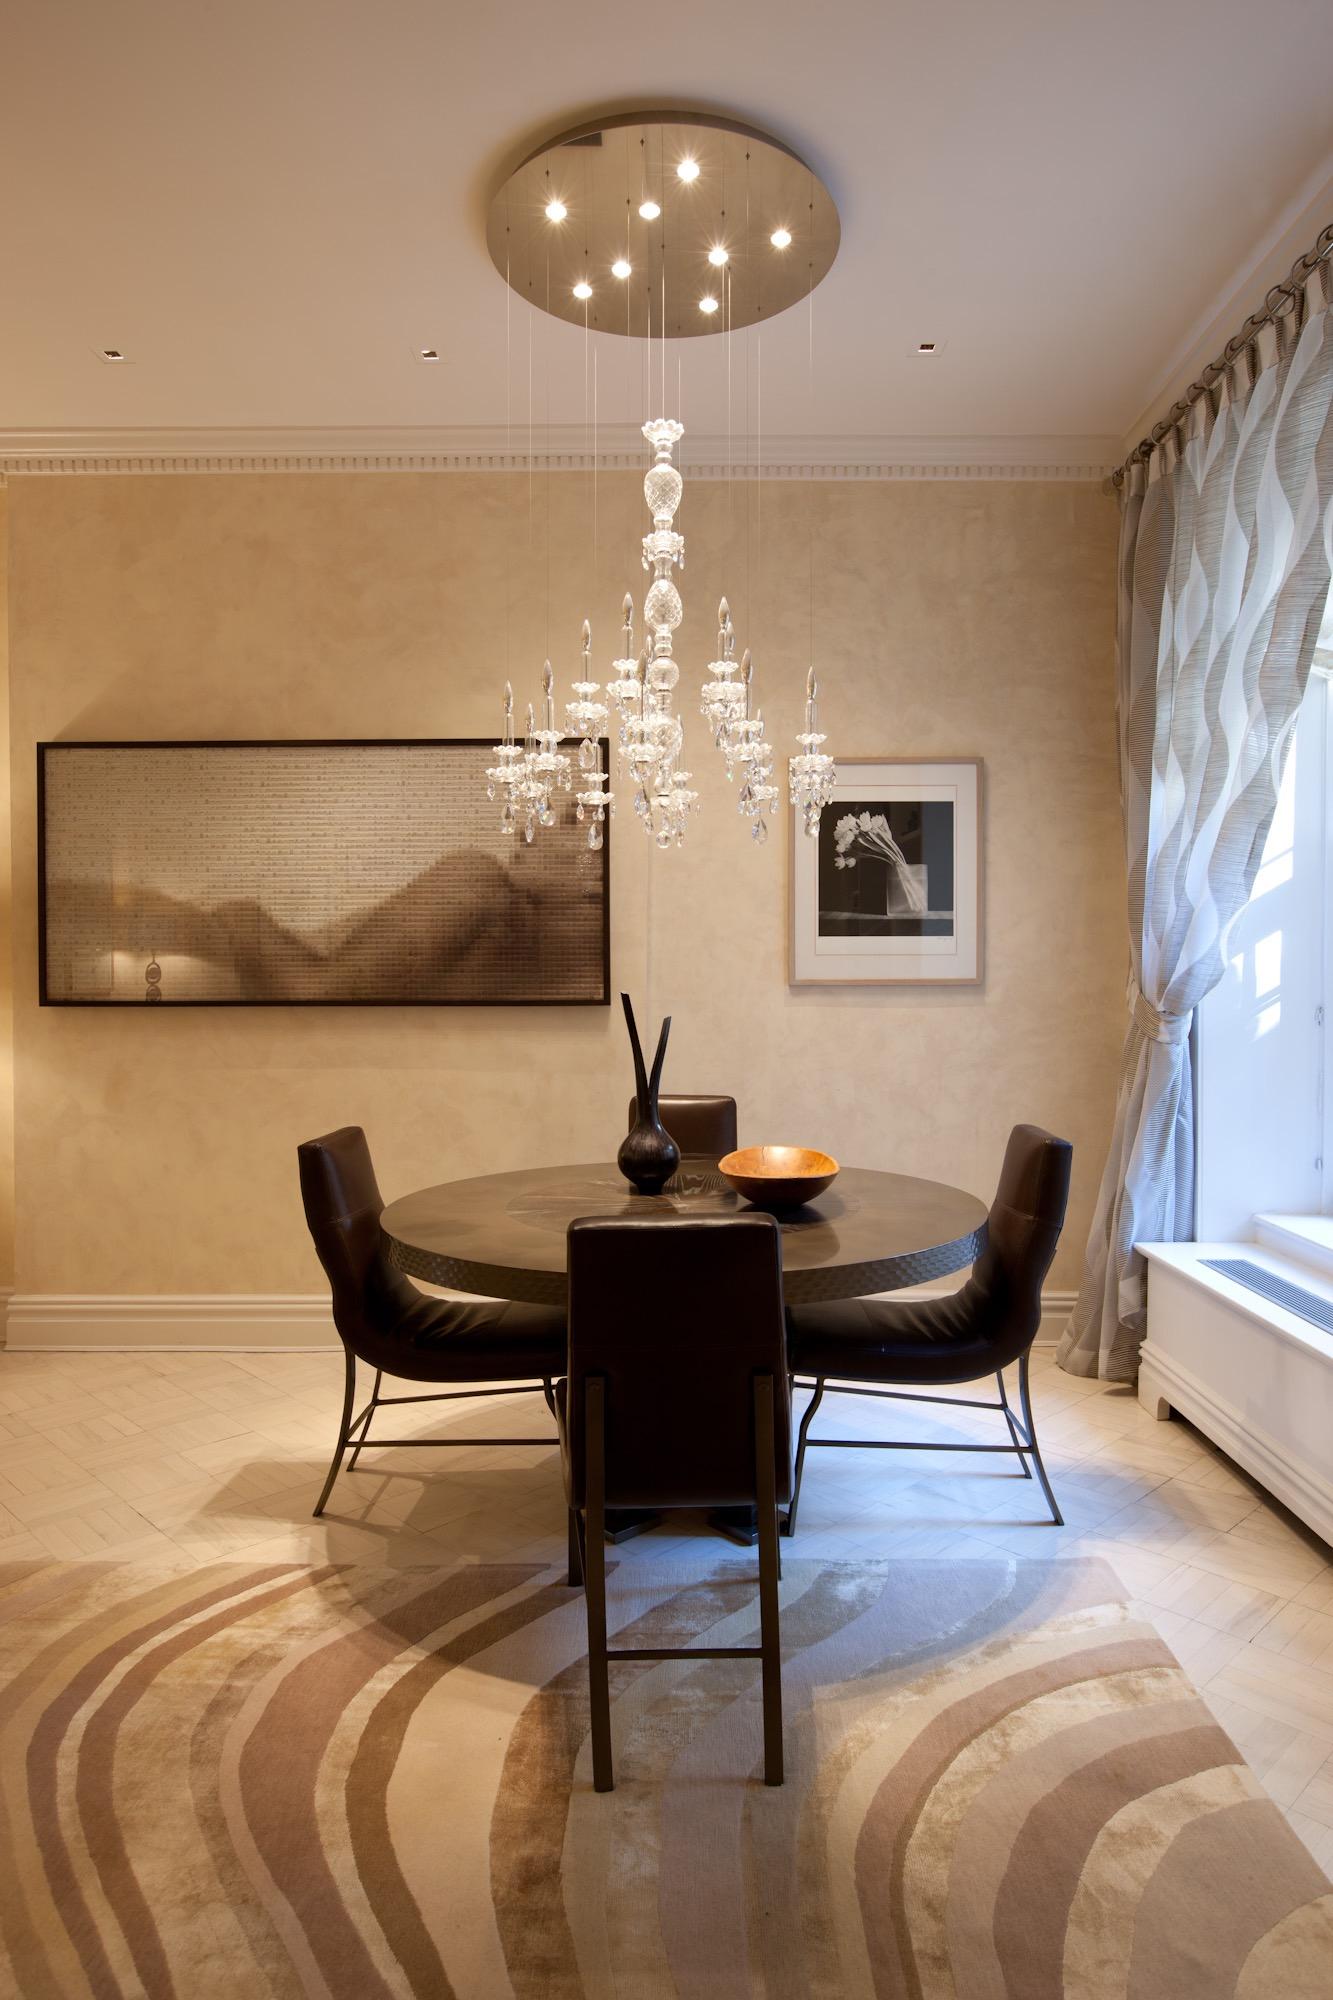 sophie-harrison-amathea-luxury-interior-design-for-professional-women-neutral serene modern dining room.jpg